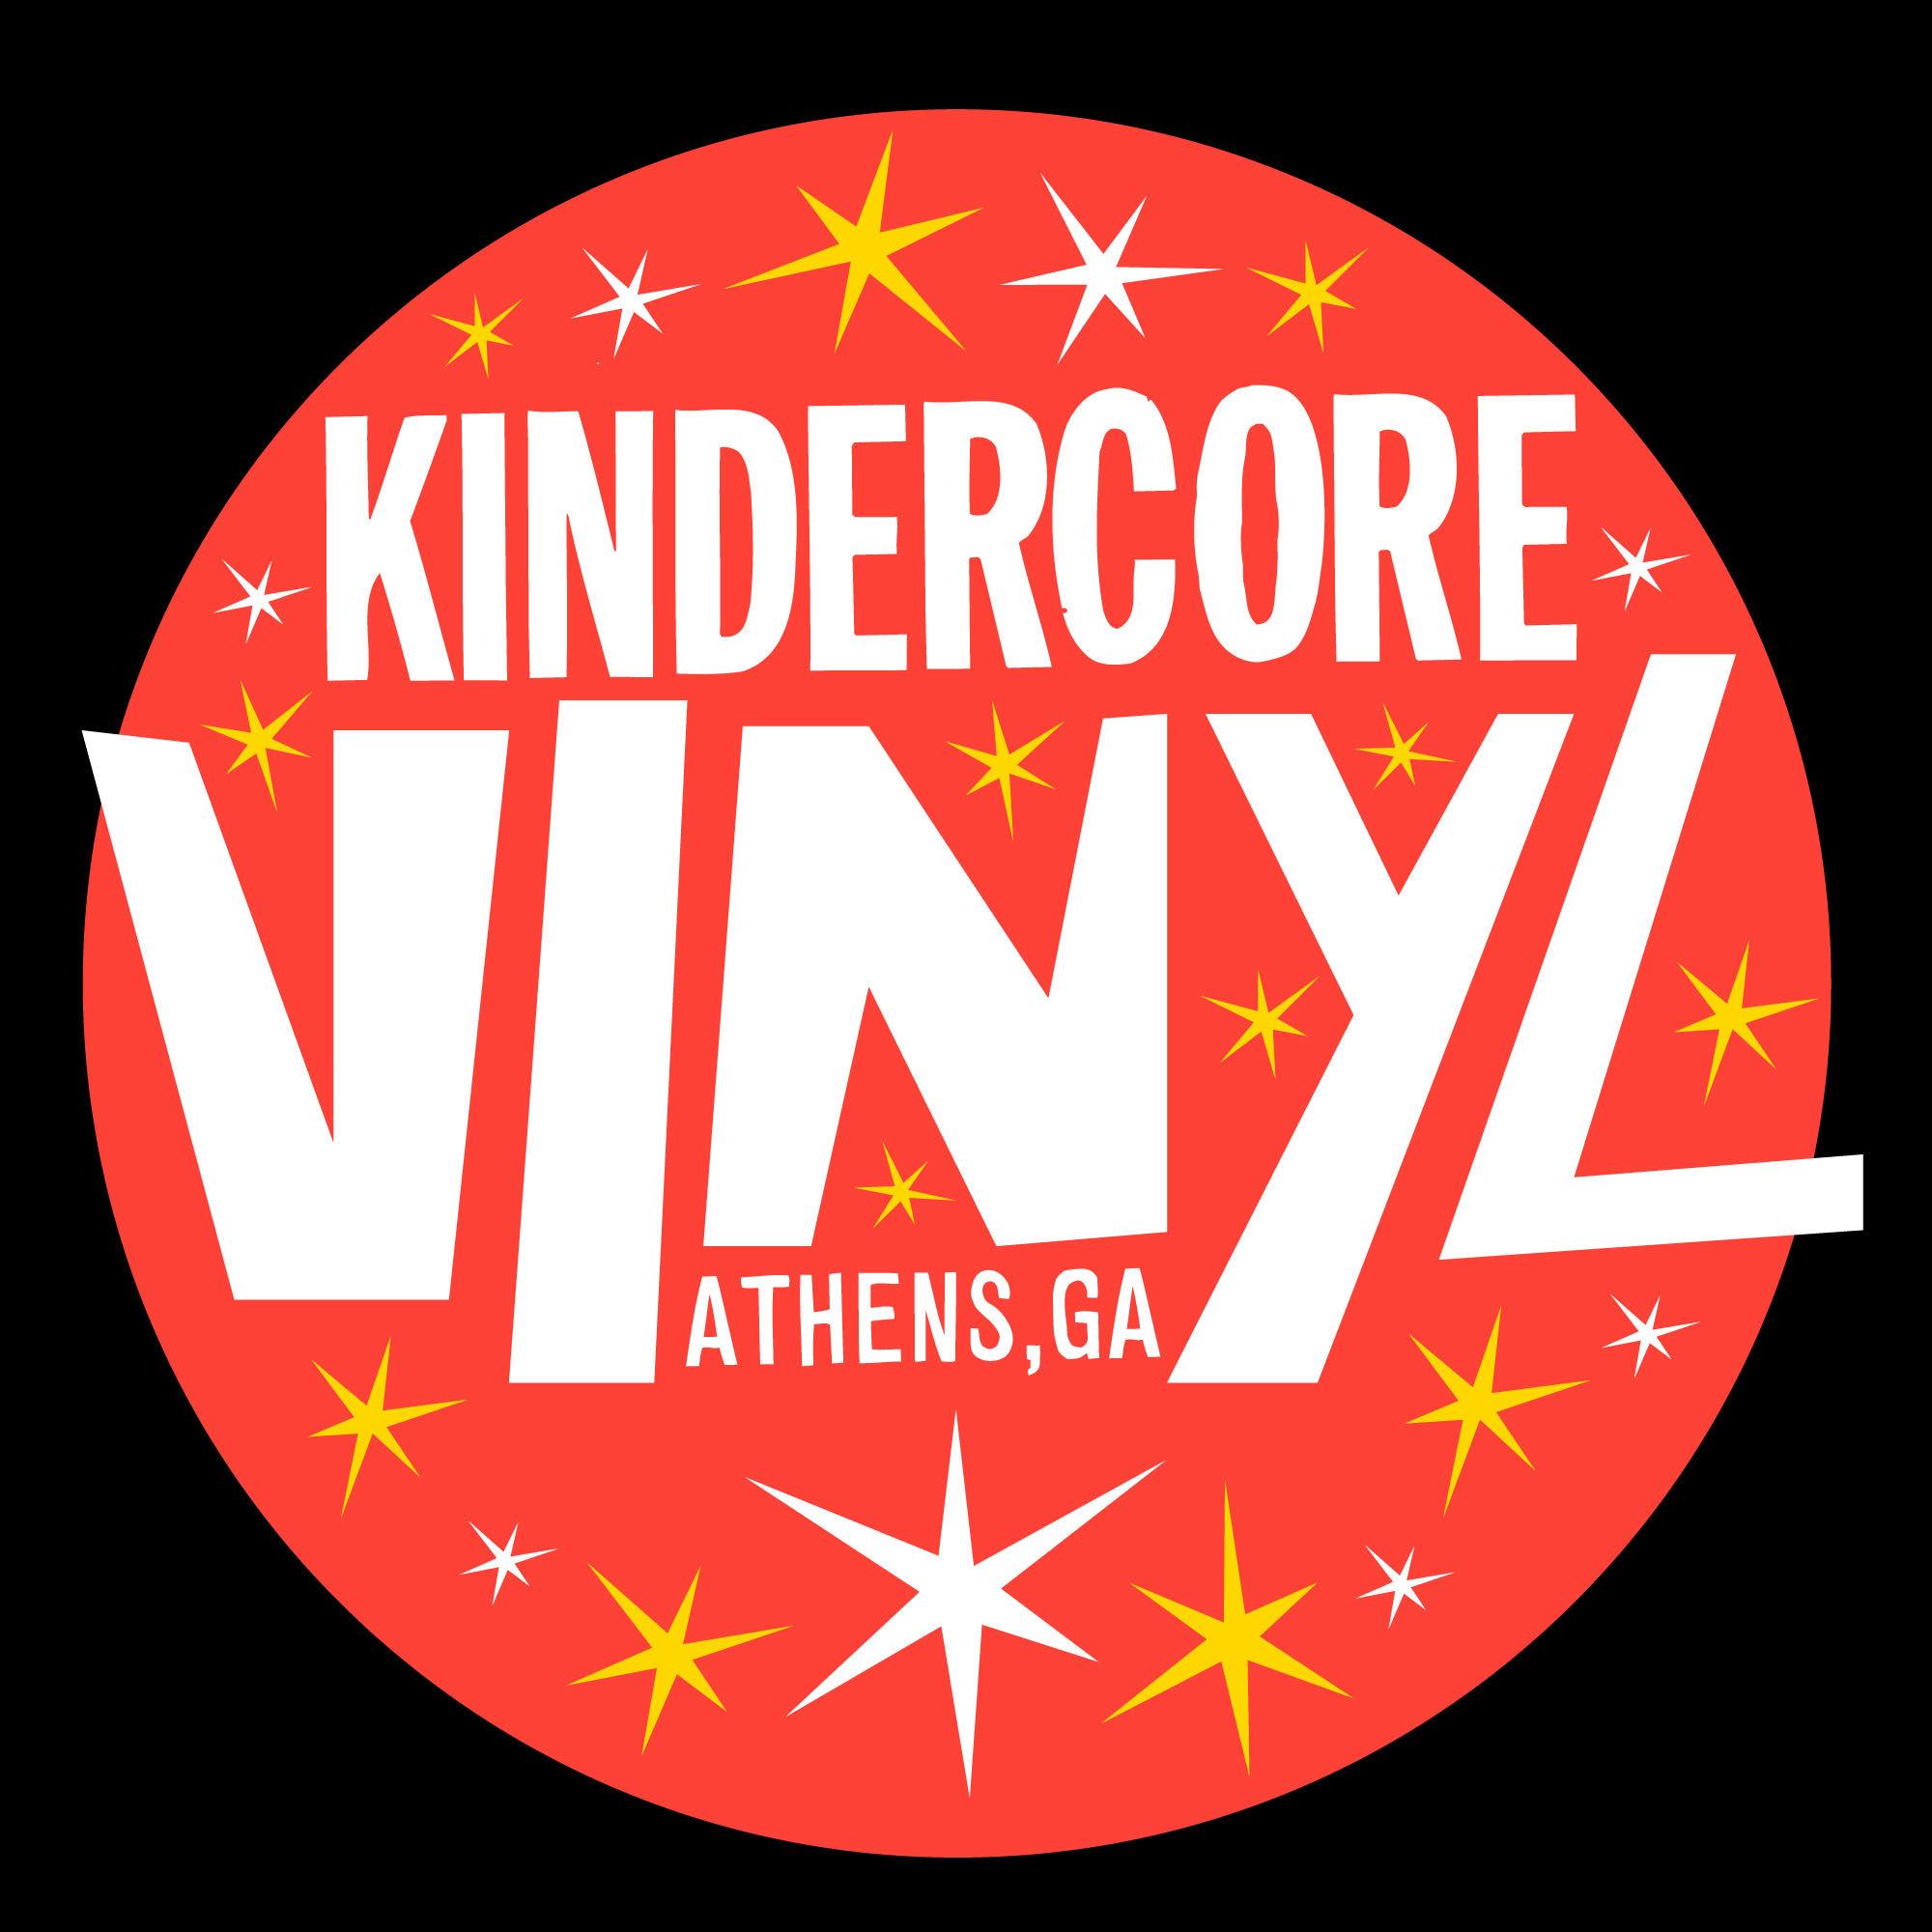 Kindercore-logo-blackbackground.jpg